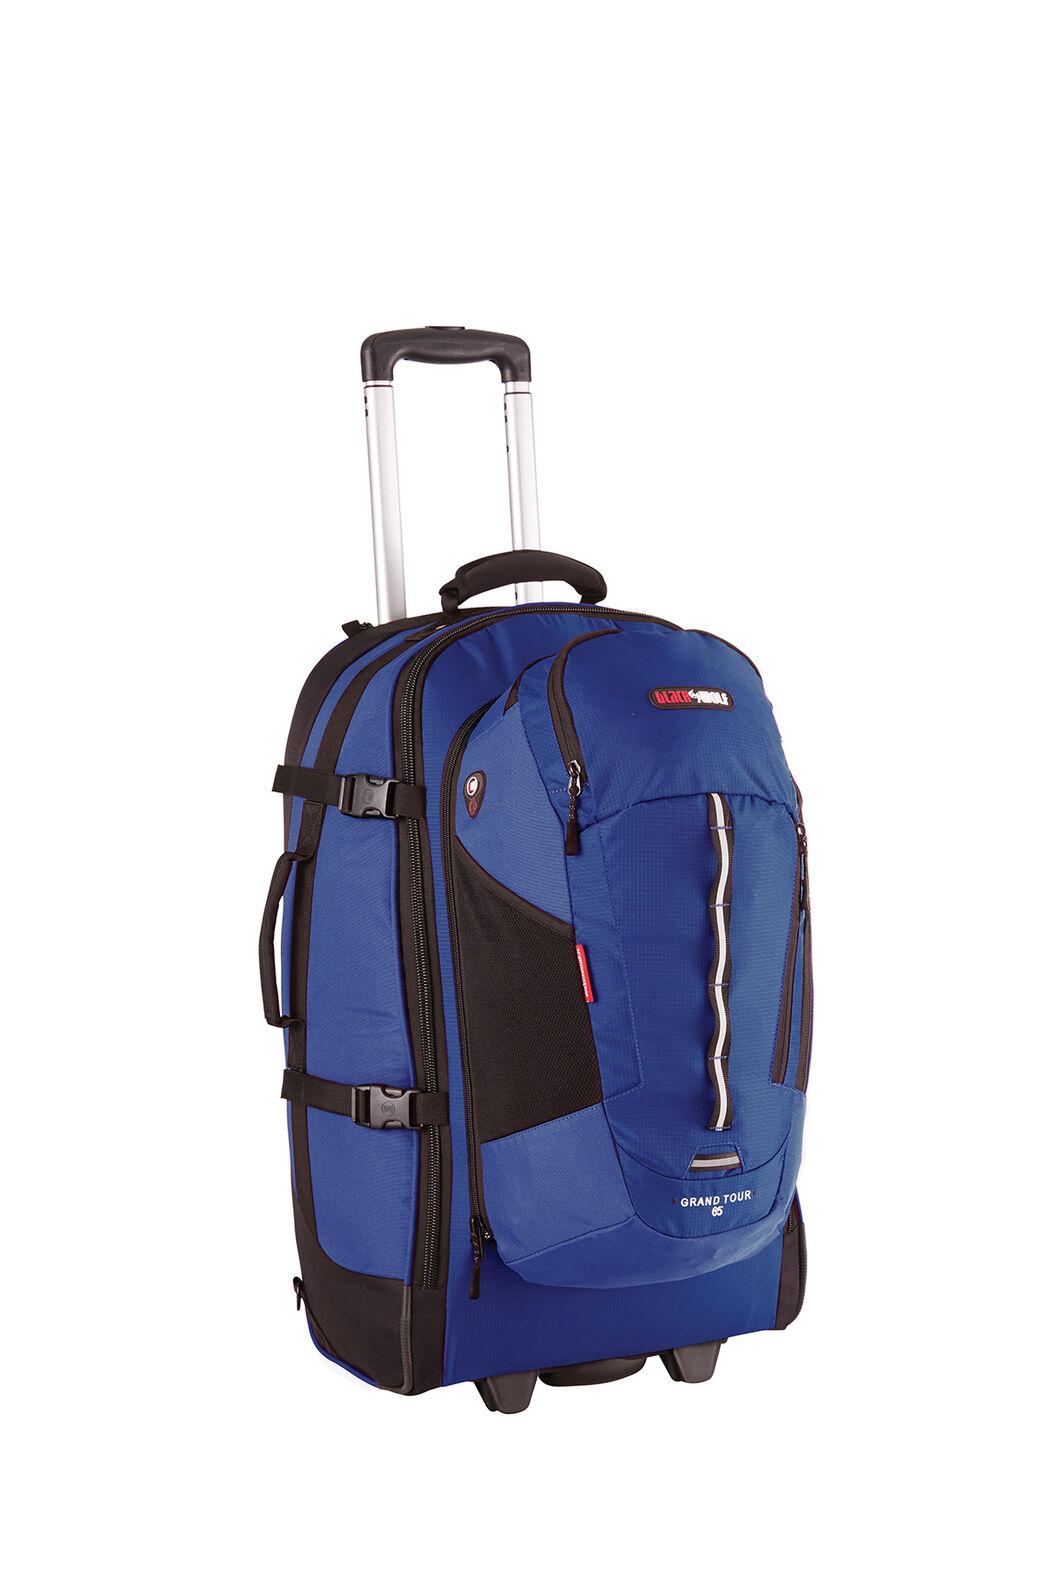 BlackWolf Grand Tour 65L Wheeled Luggage, None, hi-res